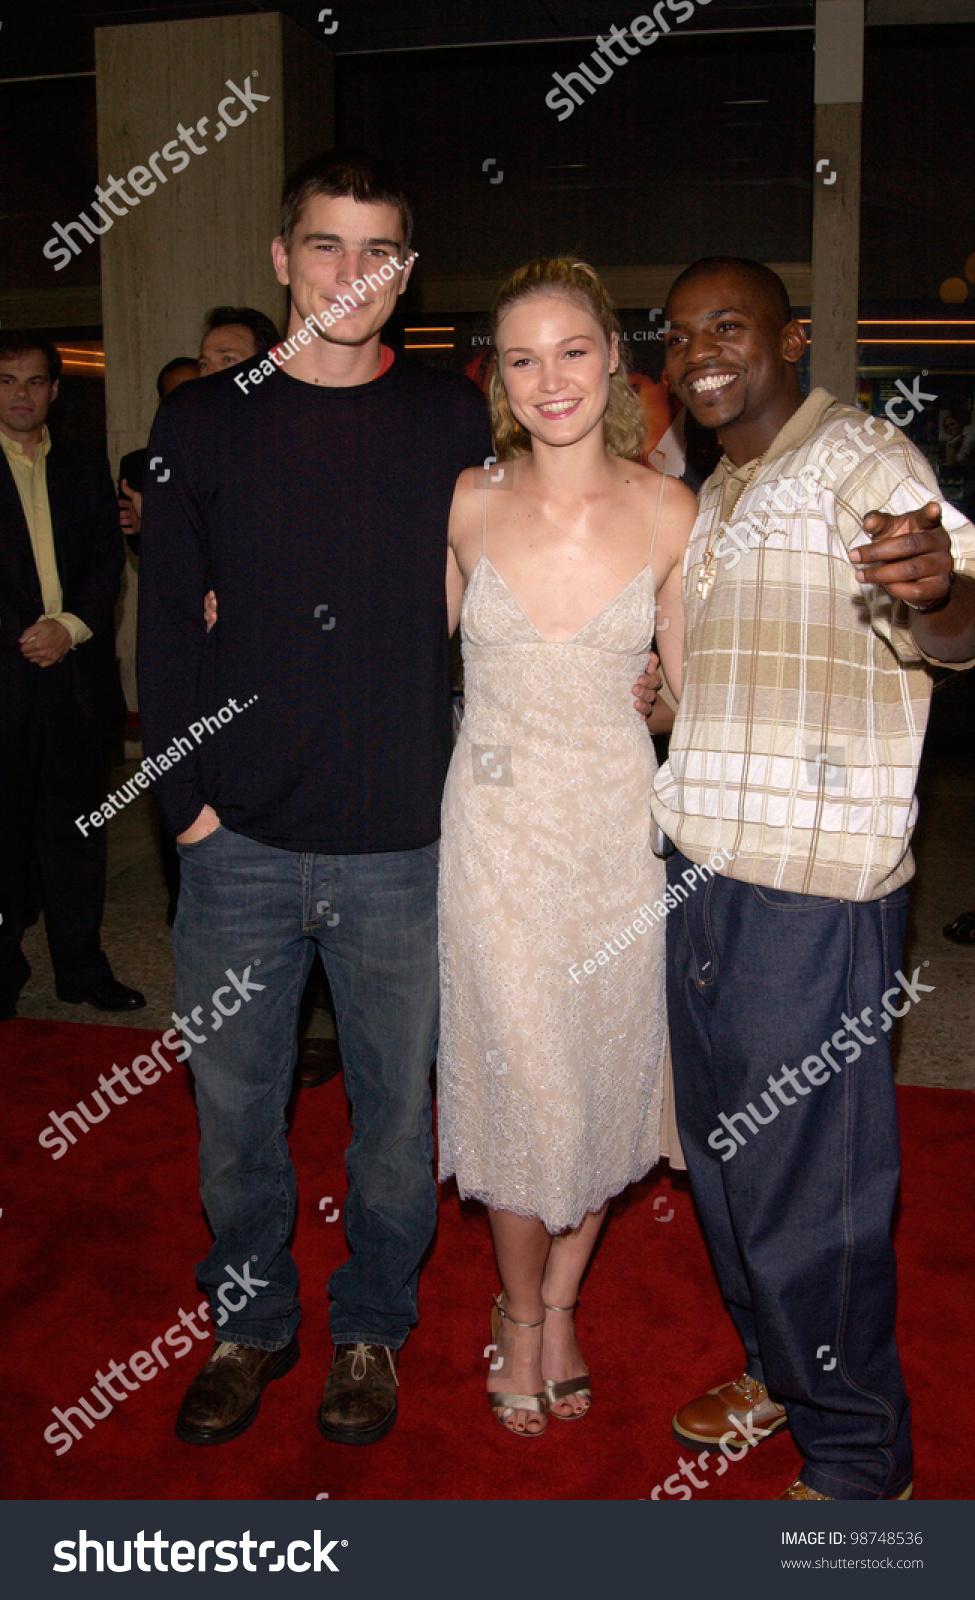 ¿Cuánto mide Josh Harnett? - Altura - Real height Stock-photo-actress-julia-stiles-with-actor-josh-hartnett-left-mekhi-phifer-at-los-angeles-premiere-of-98748536